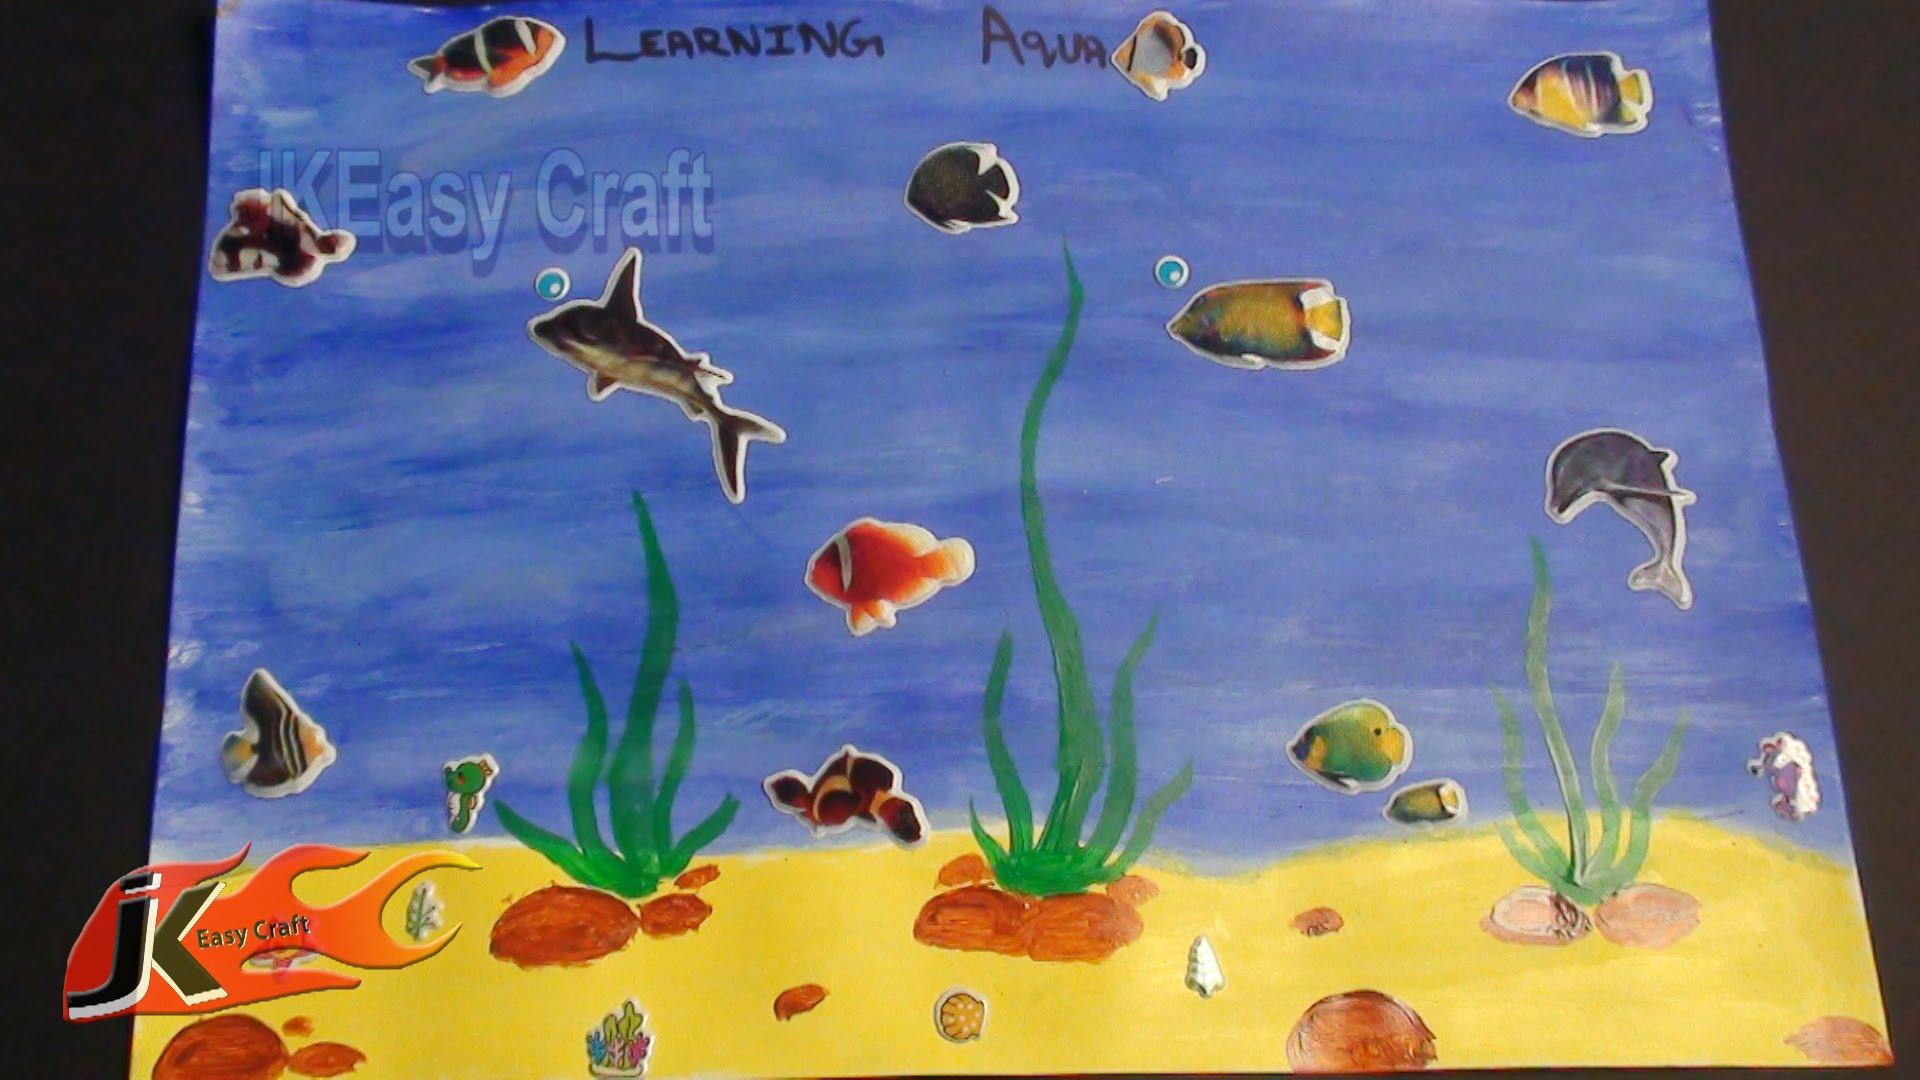 1920x1080 Draw Under Water Scene School Project For Kids Jk Easy Craft